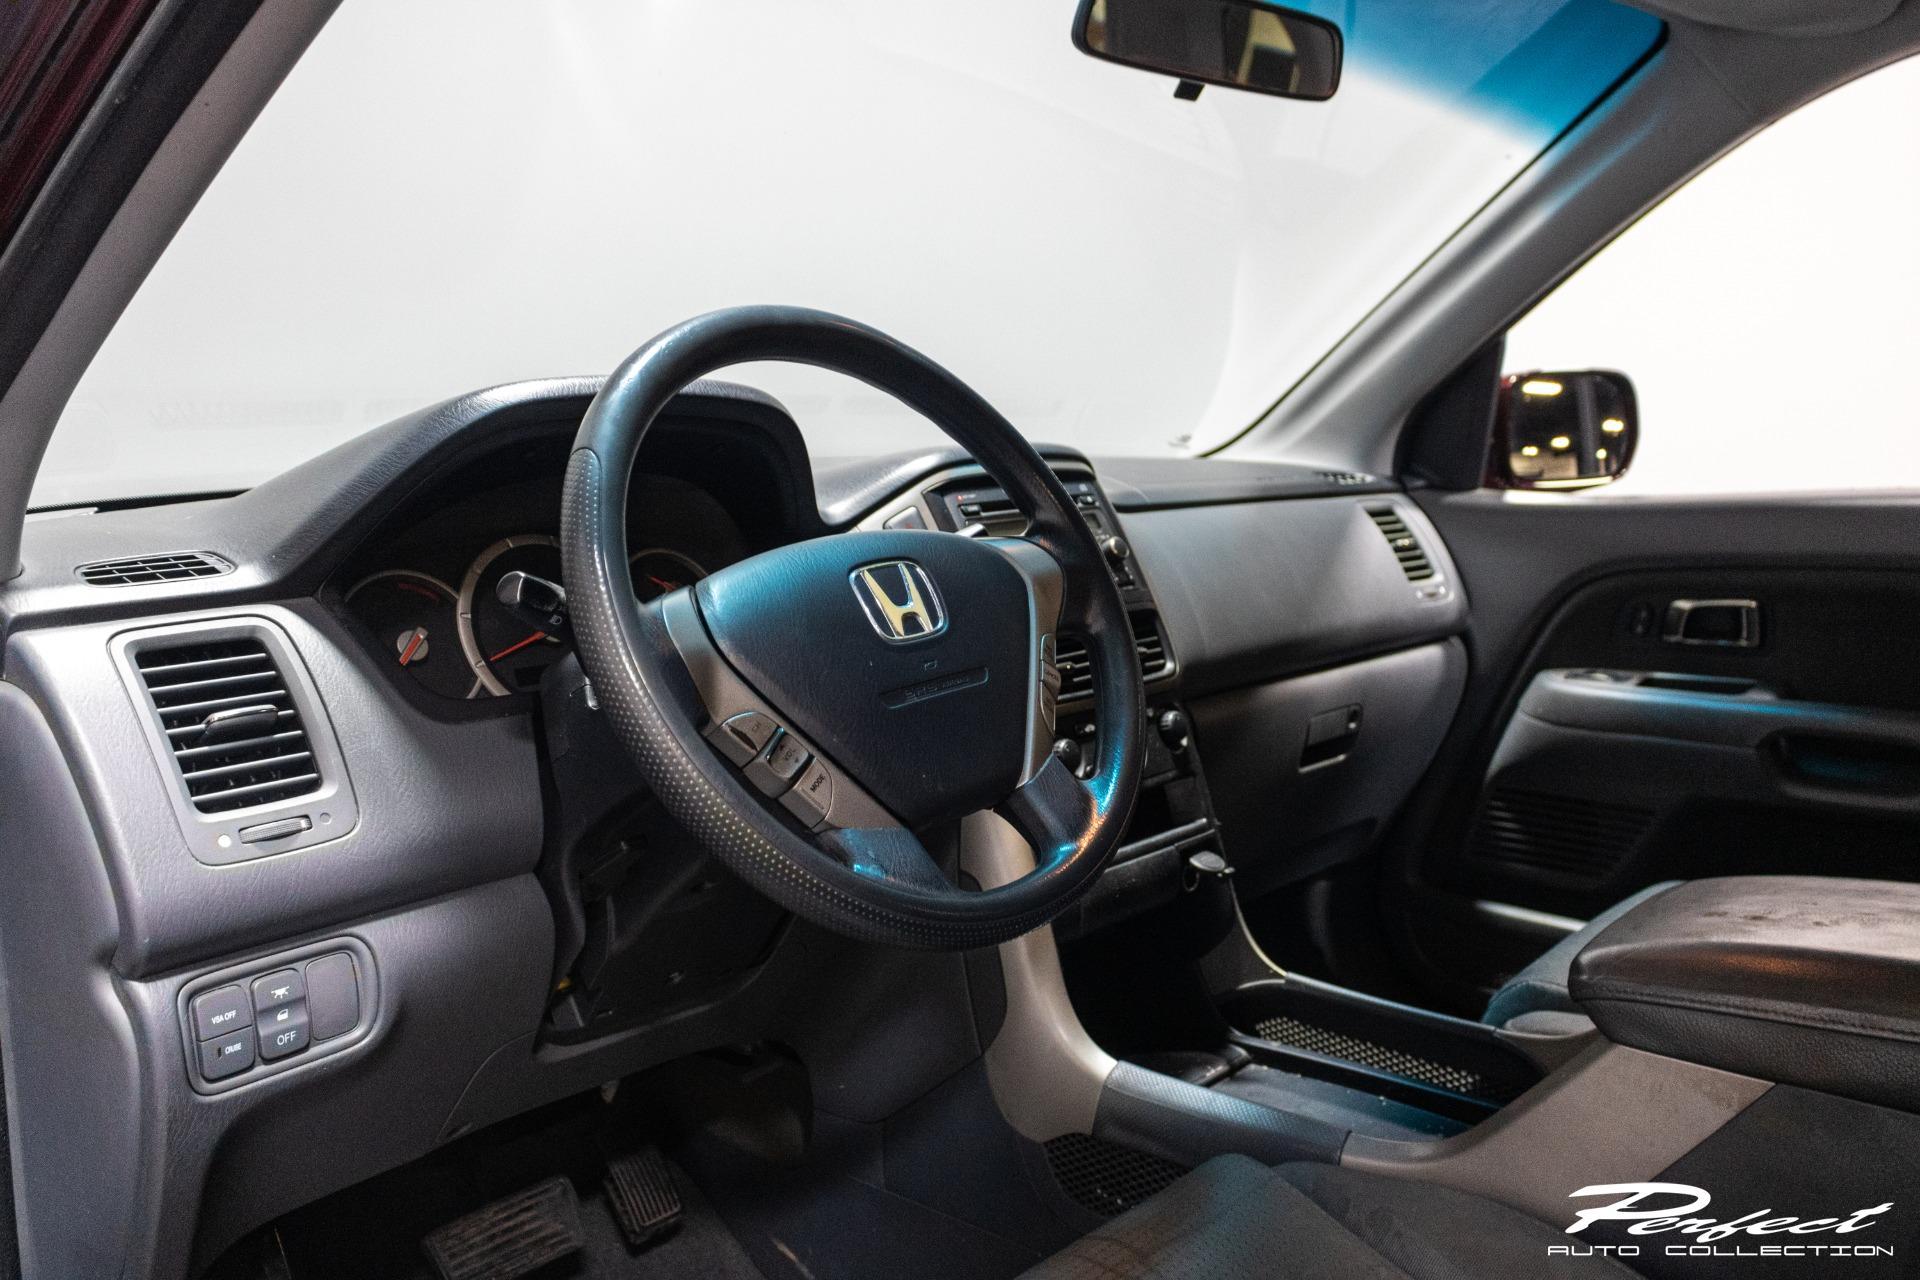 Used 2008 Honda Pilot VP